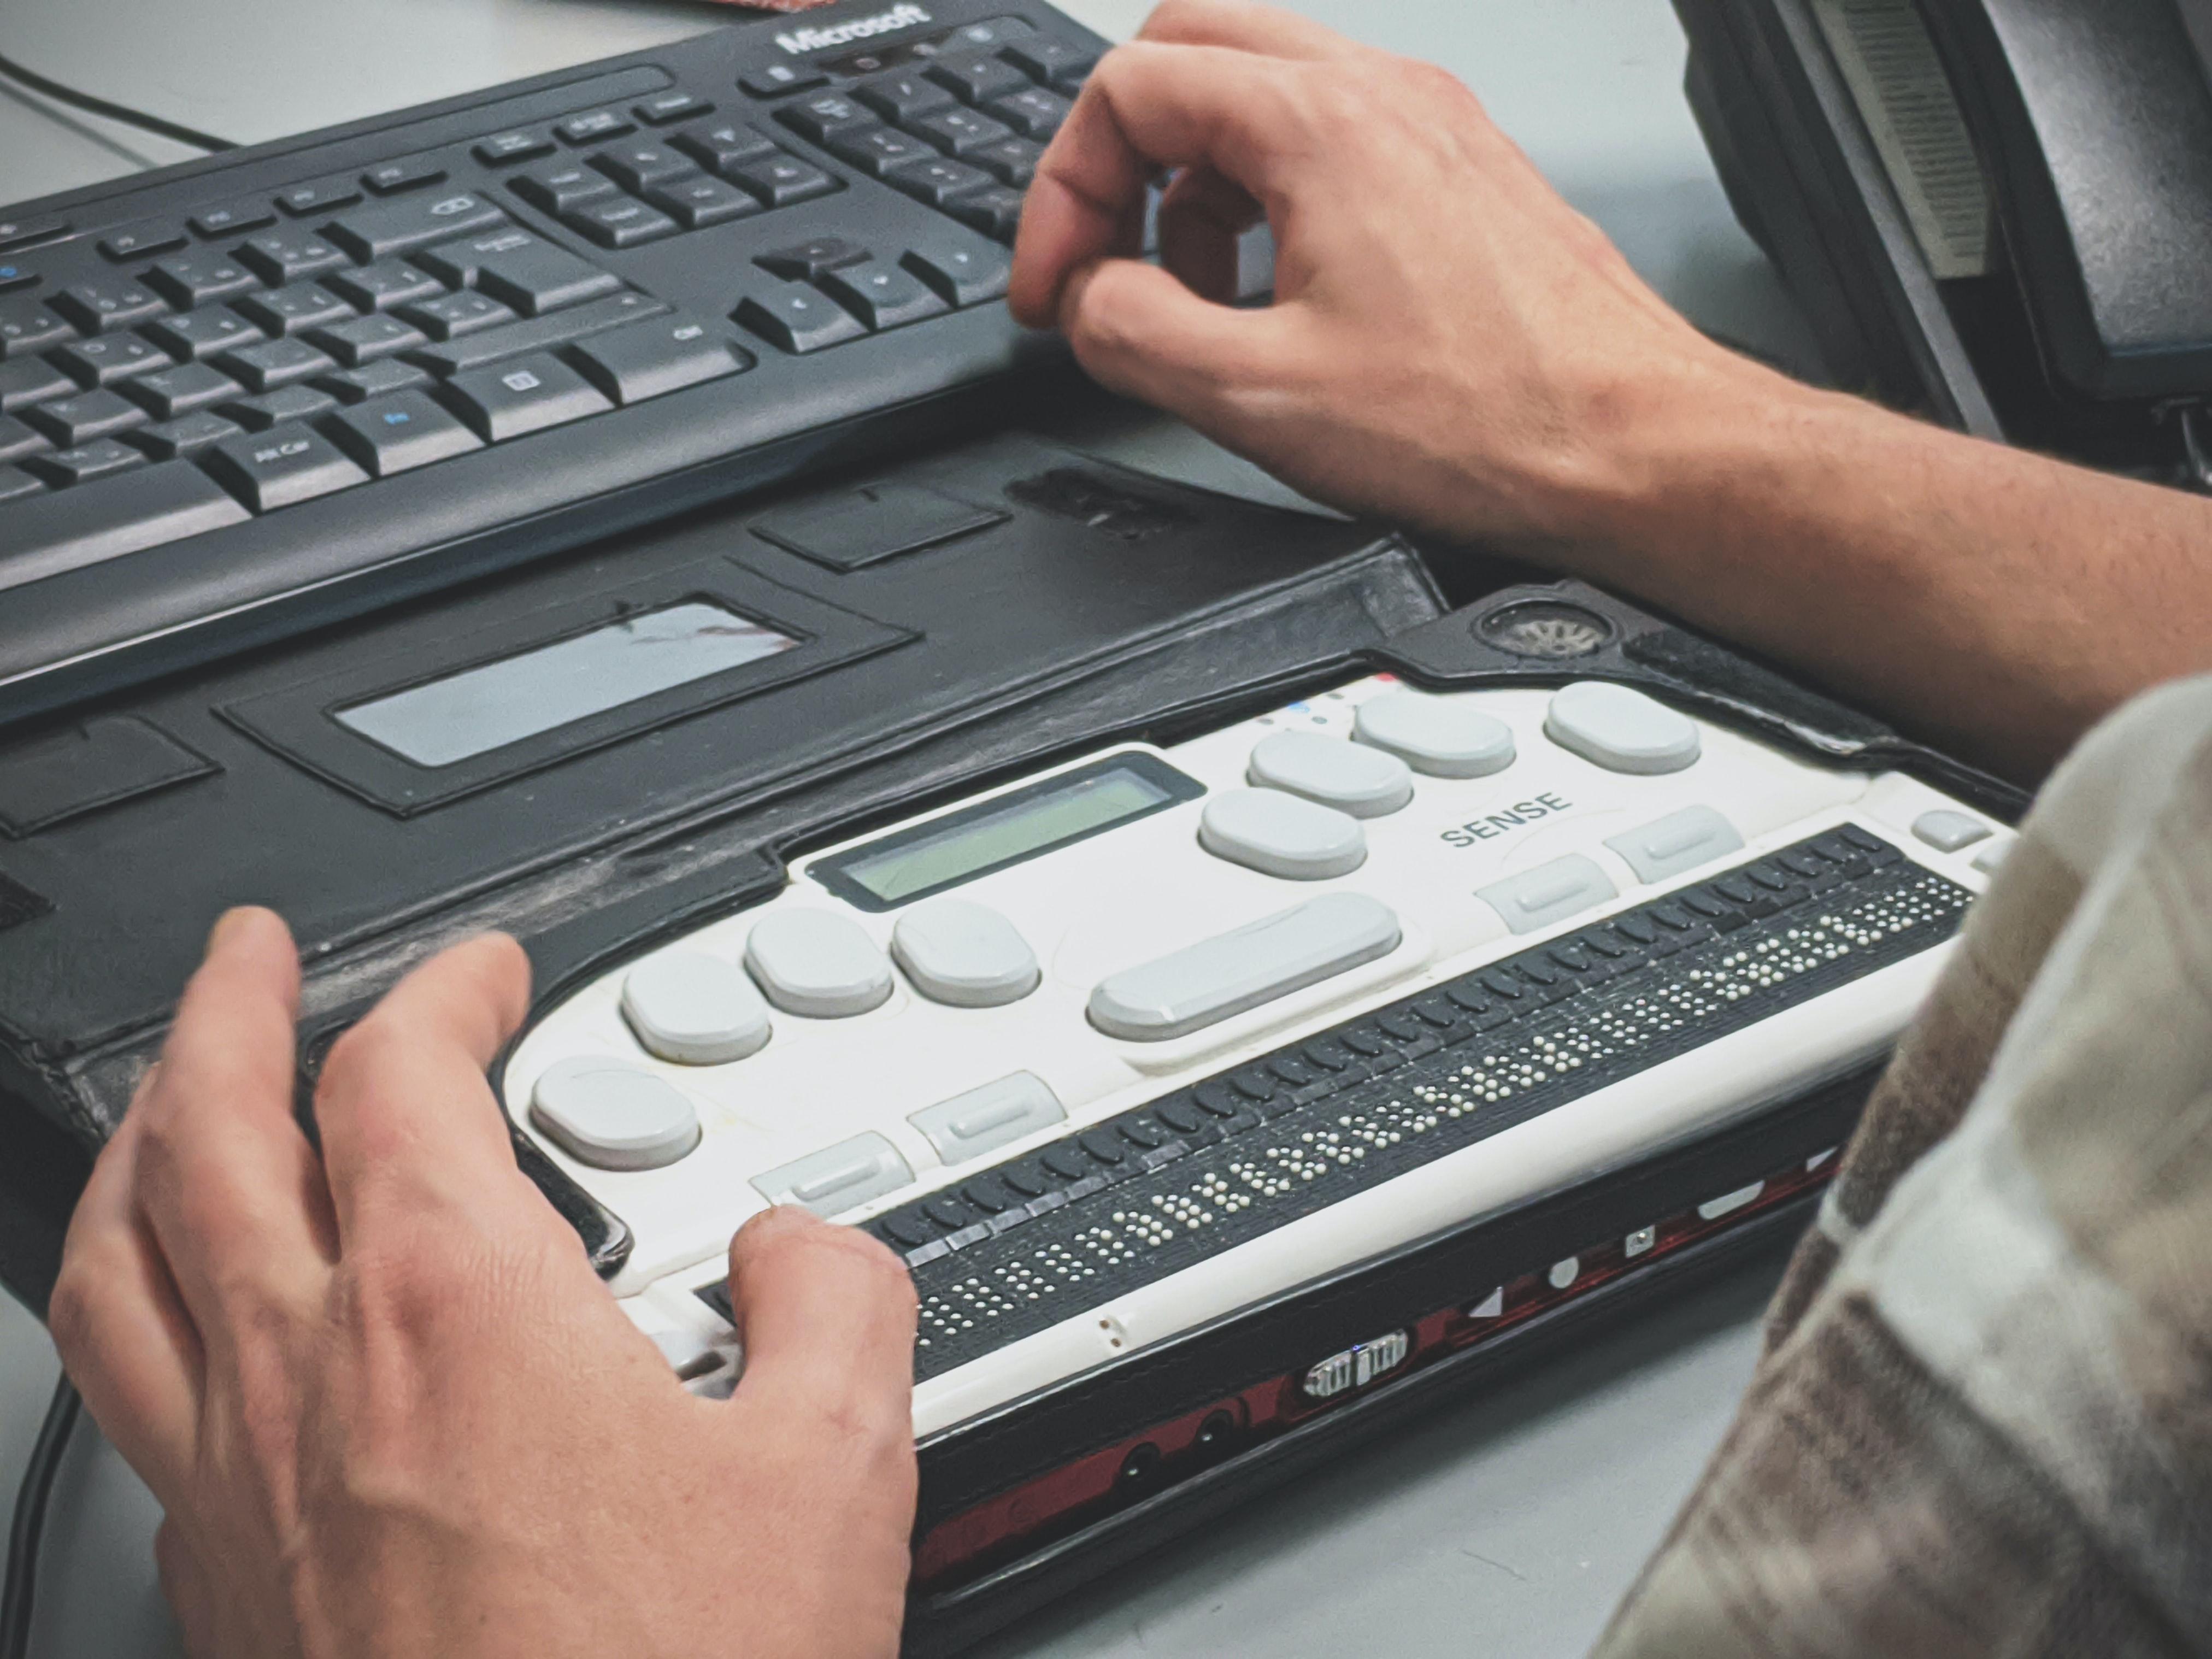 Blind man using a braille screen reader